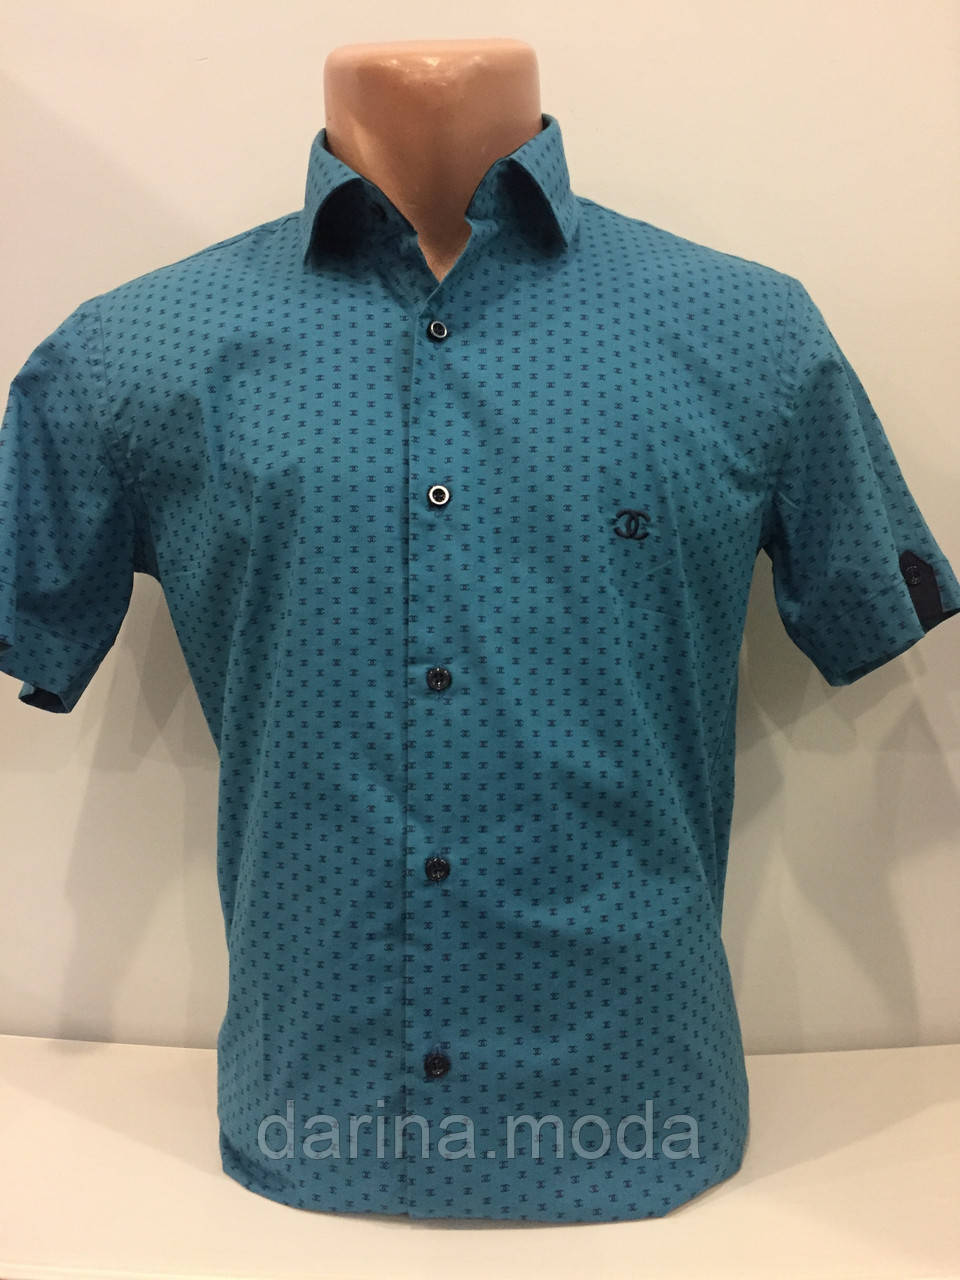 Мужская рубашка с коротким рукавом на пуговицах S,L